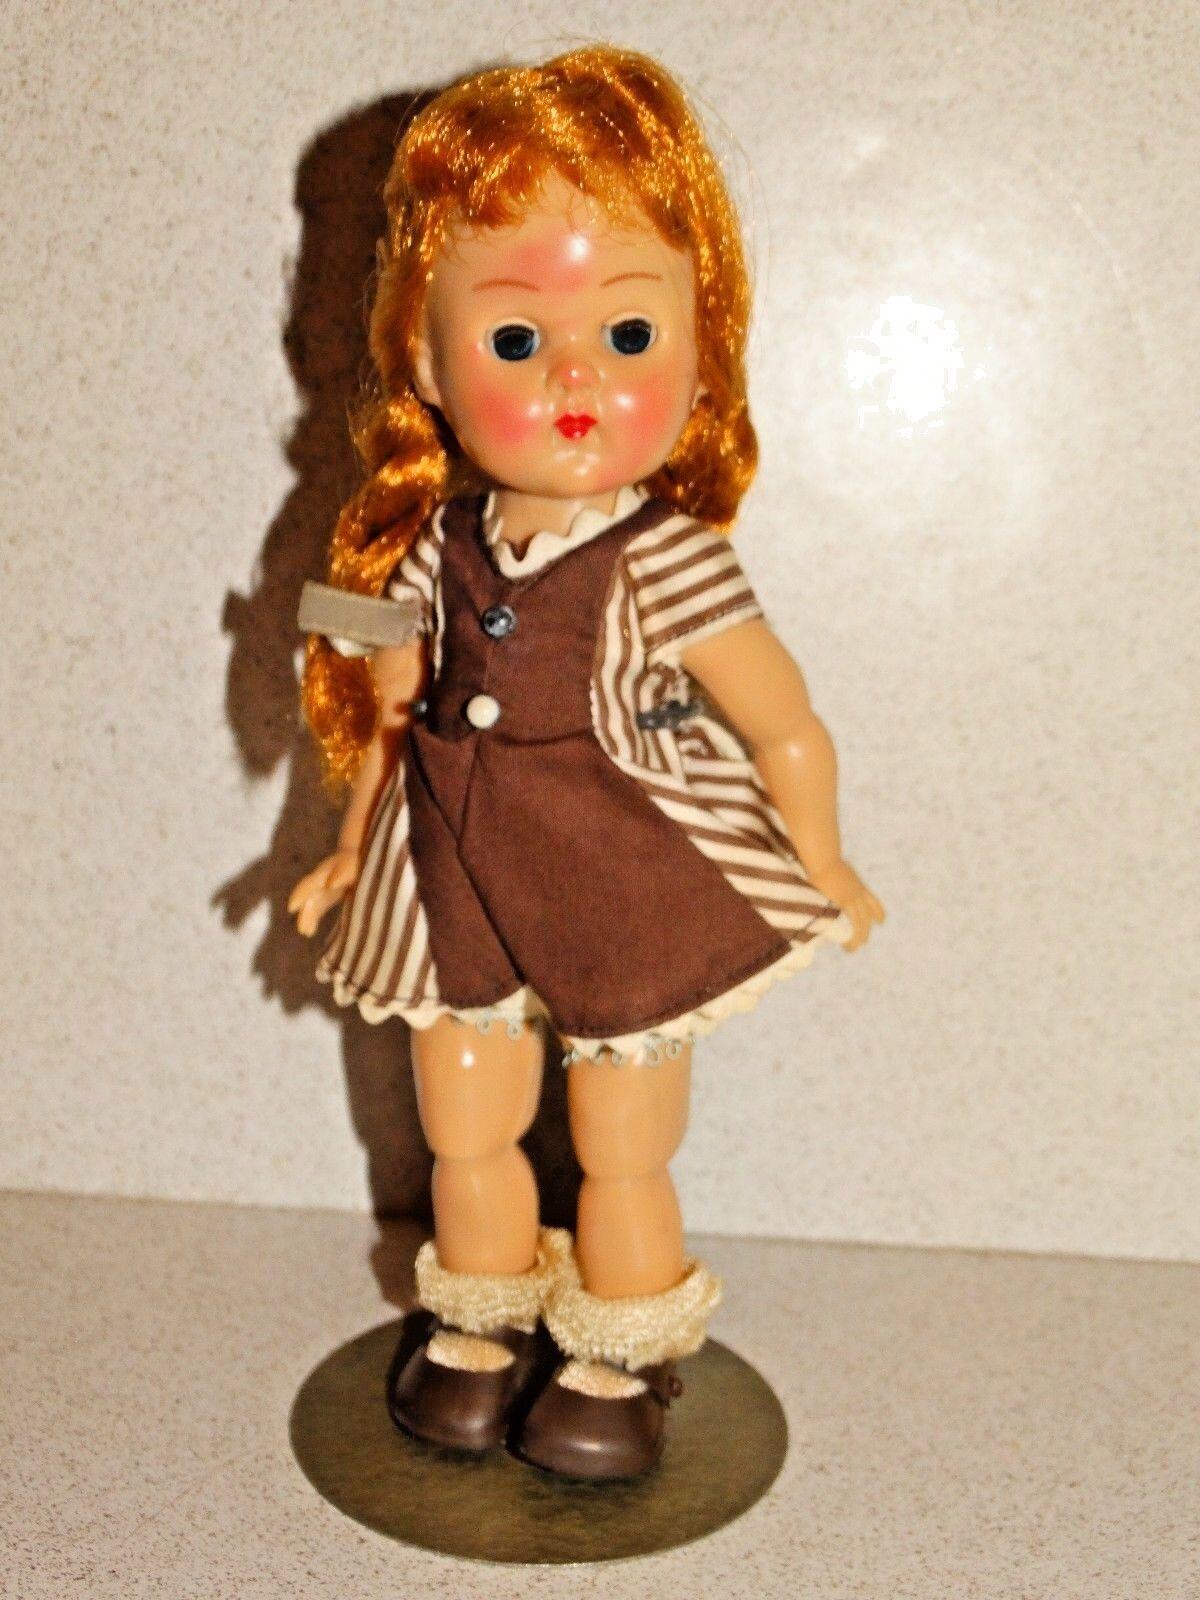 Moda Vintage 1950s pelirroja Ginny BK Walker Muñeca con fiebre azulsh & Ginny Stand